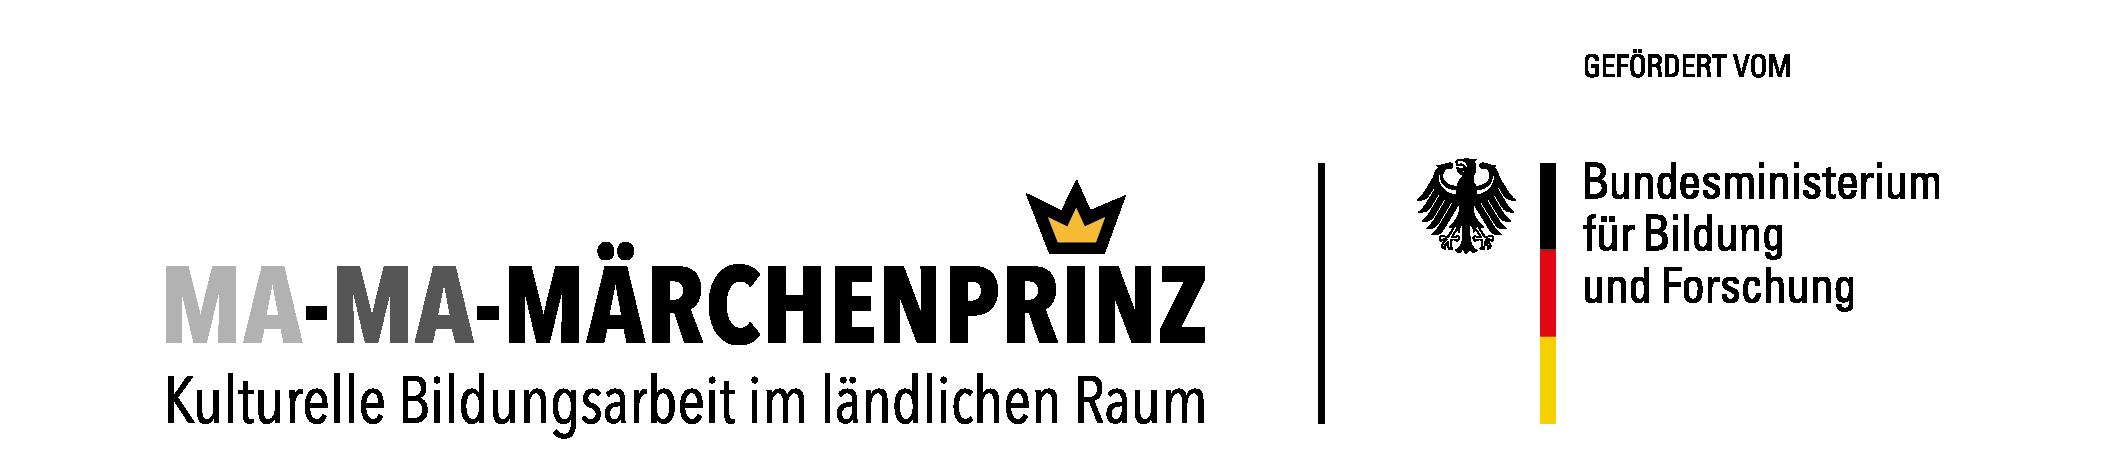 Maerchenprinz_Logo_BMBF